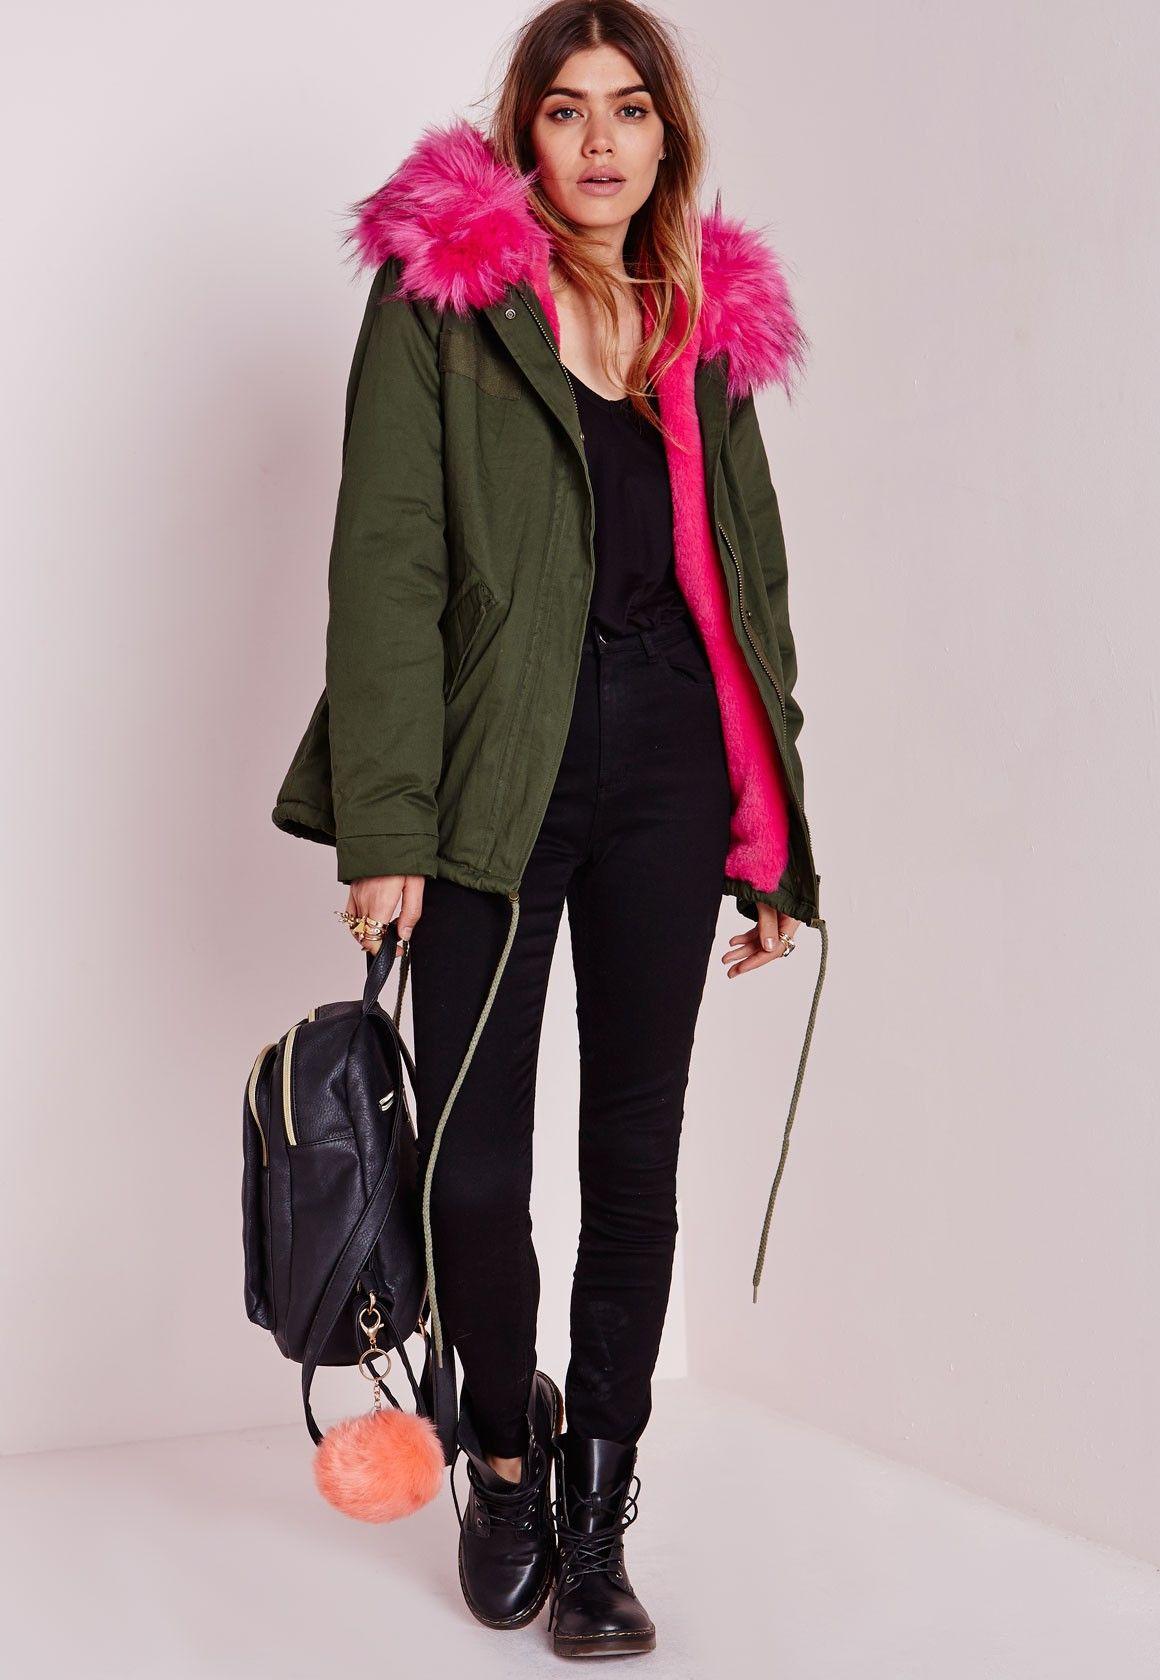 10b4d35913969 Missguided - Fur Hood Short Parka Coat Khaki/Hot Pink | outfit ...